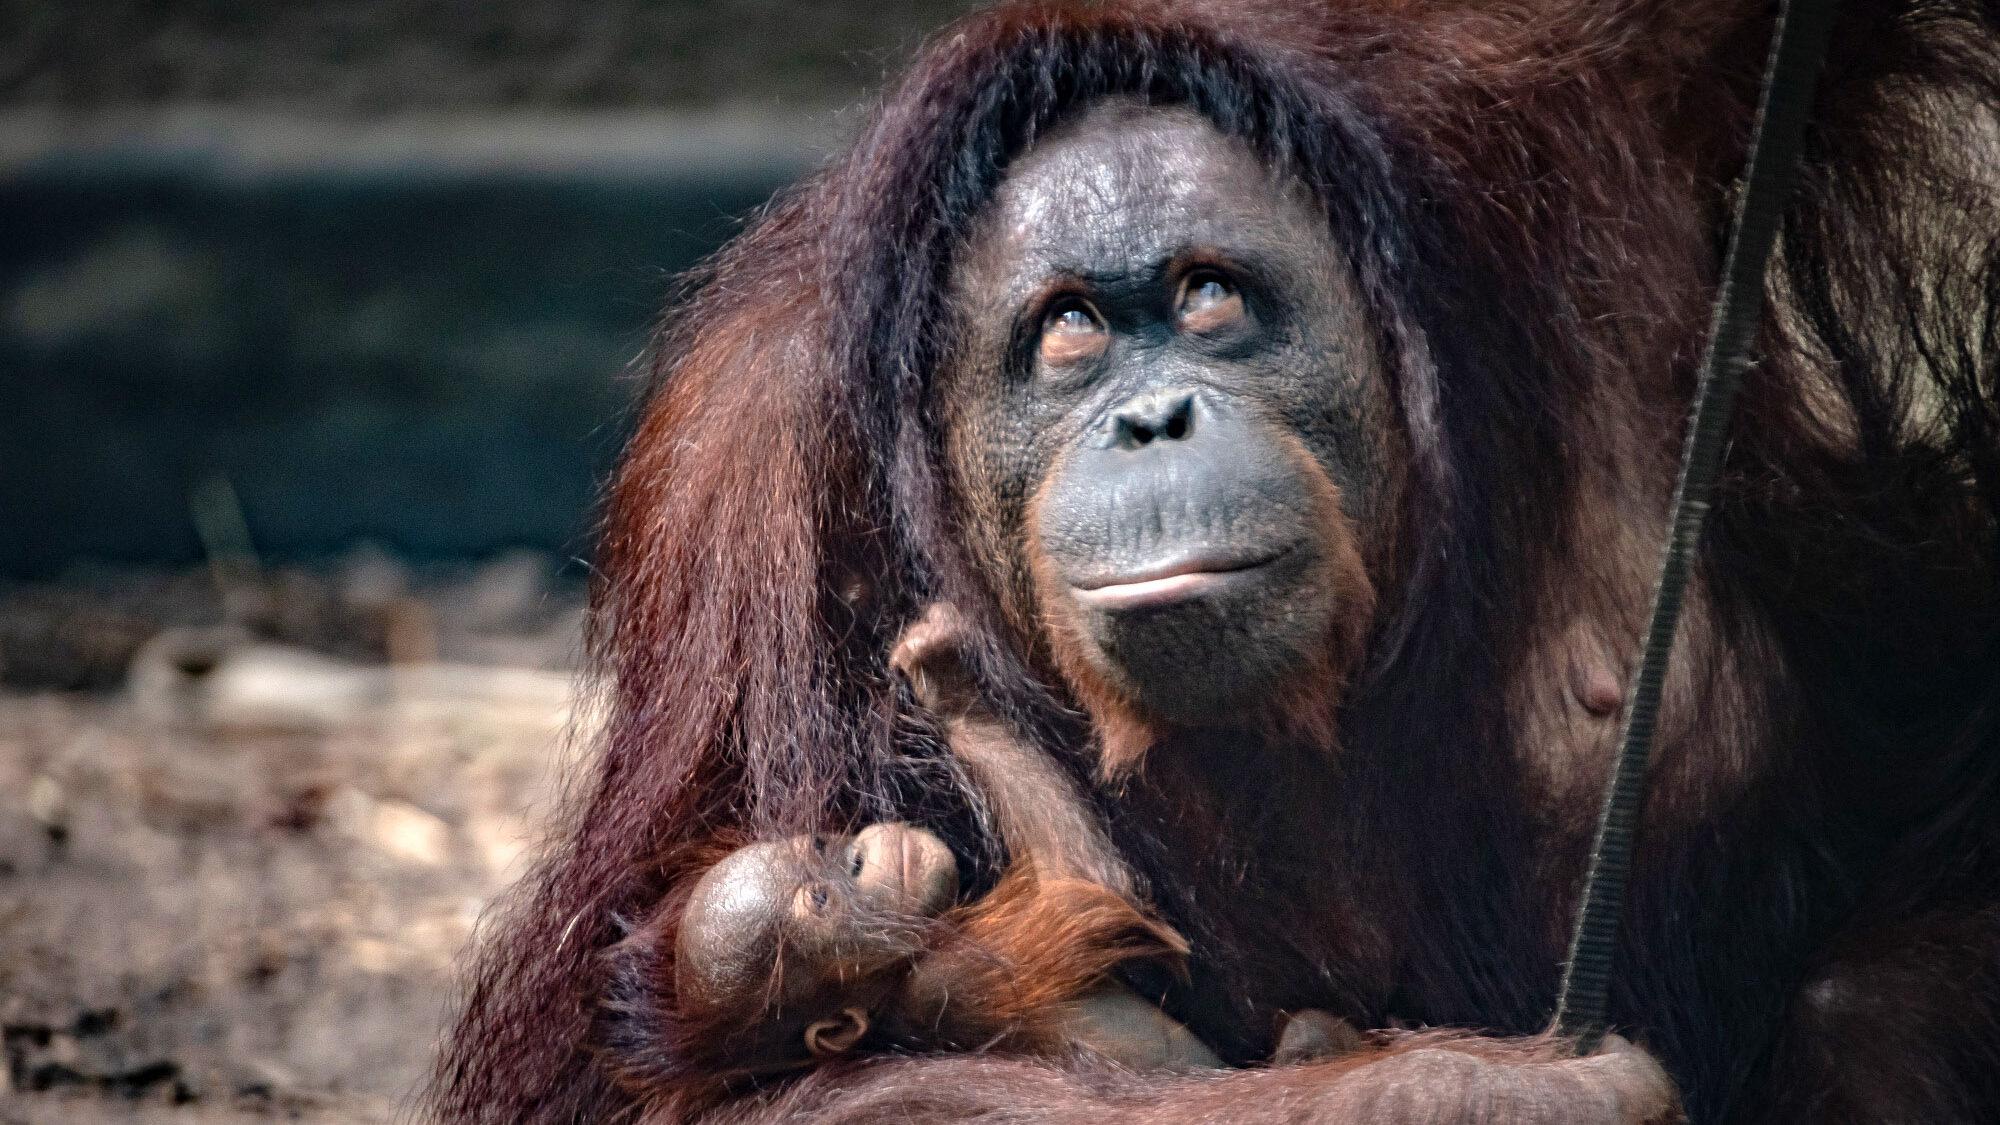 Bornean Baby: Zoo Welcomes 'Surprise' Endangered Orangutan